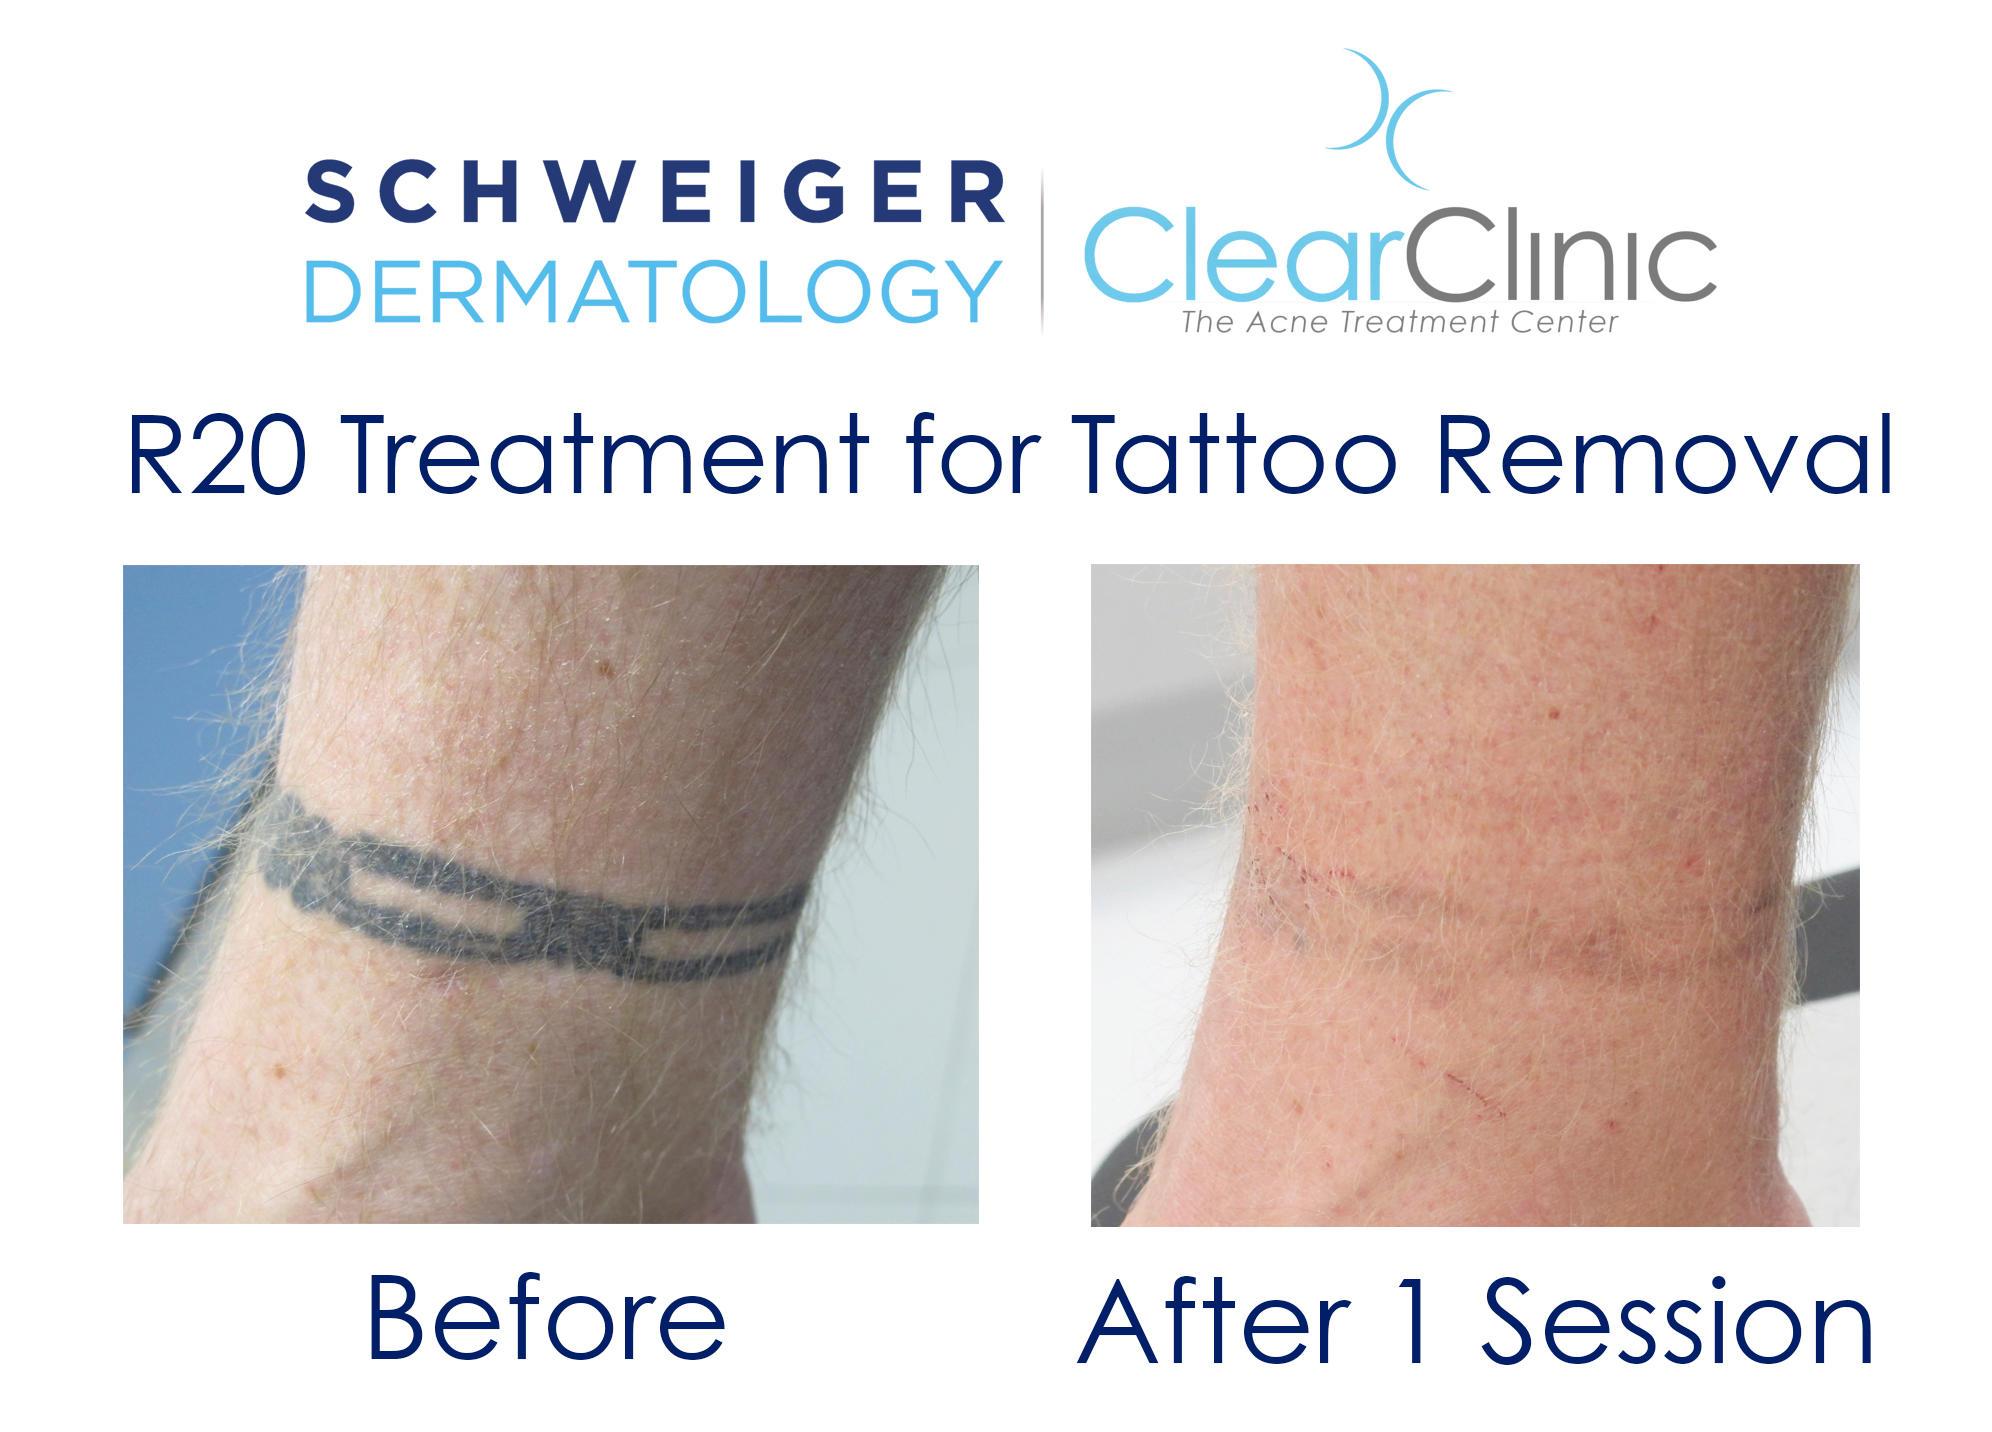 Schweiger Dermatology Group - Yonkers image 1